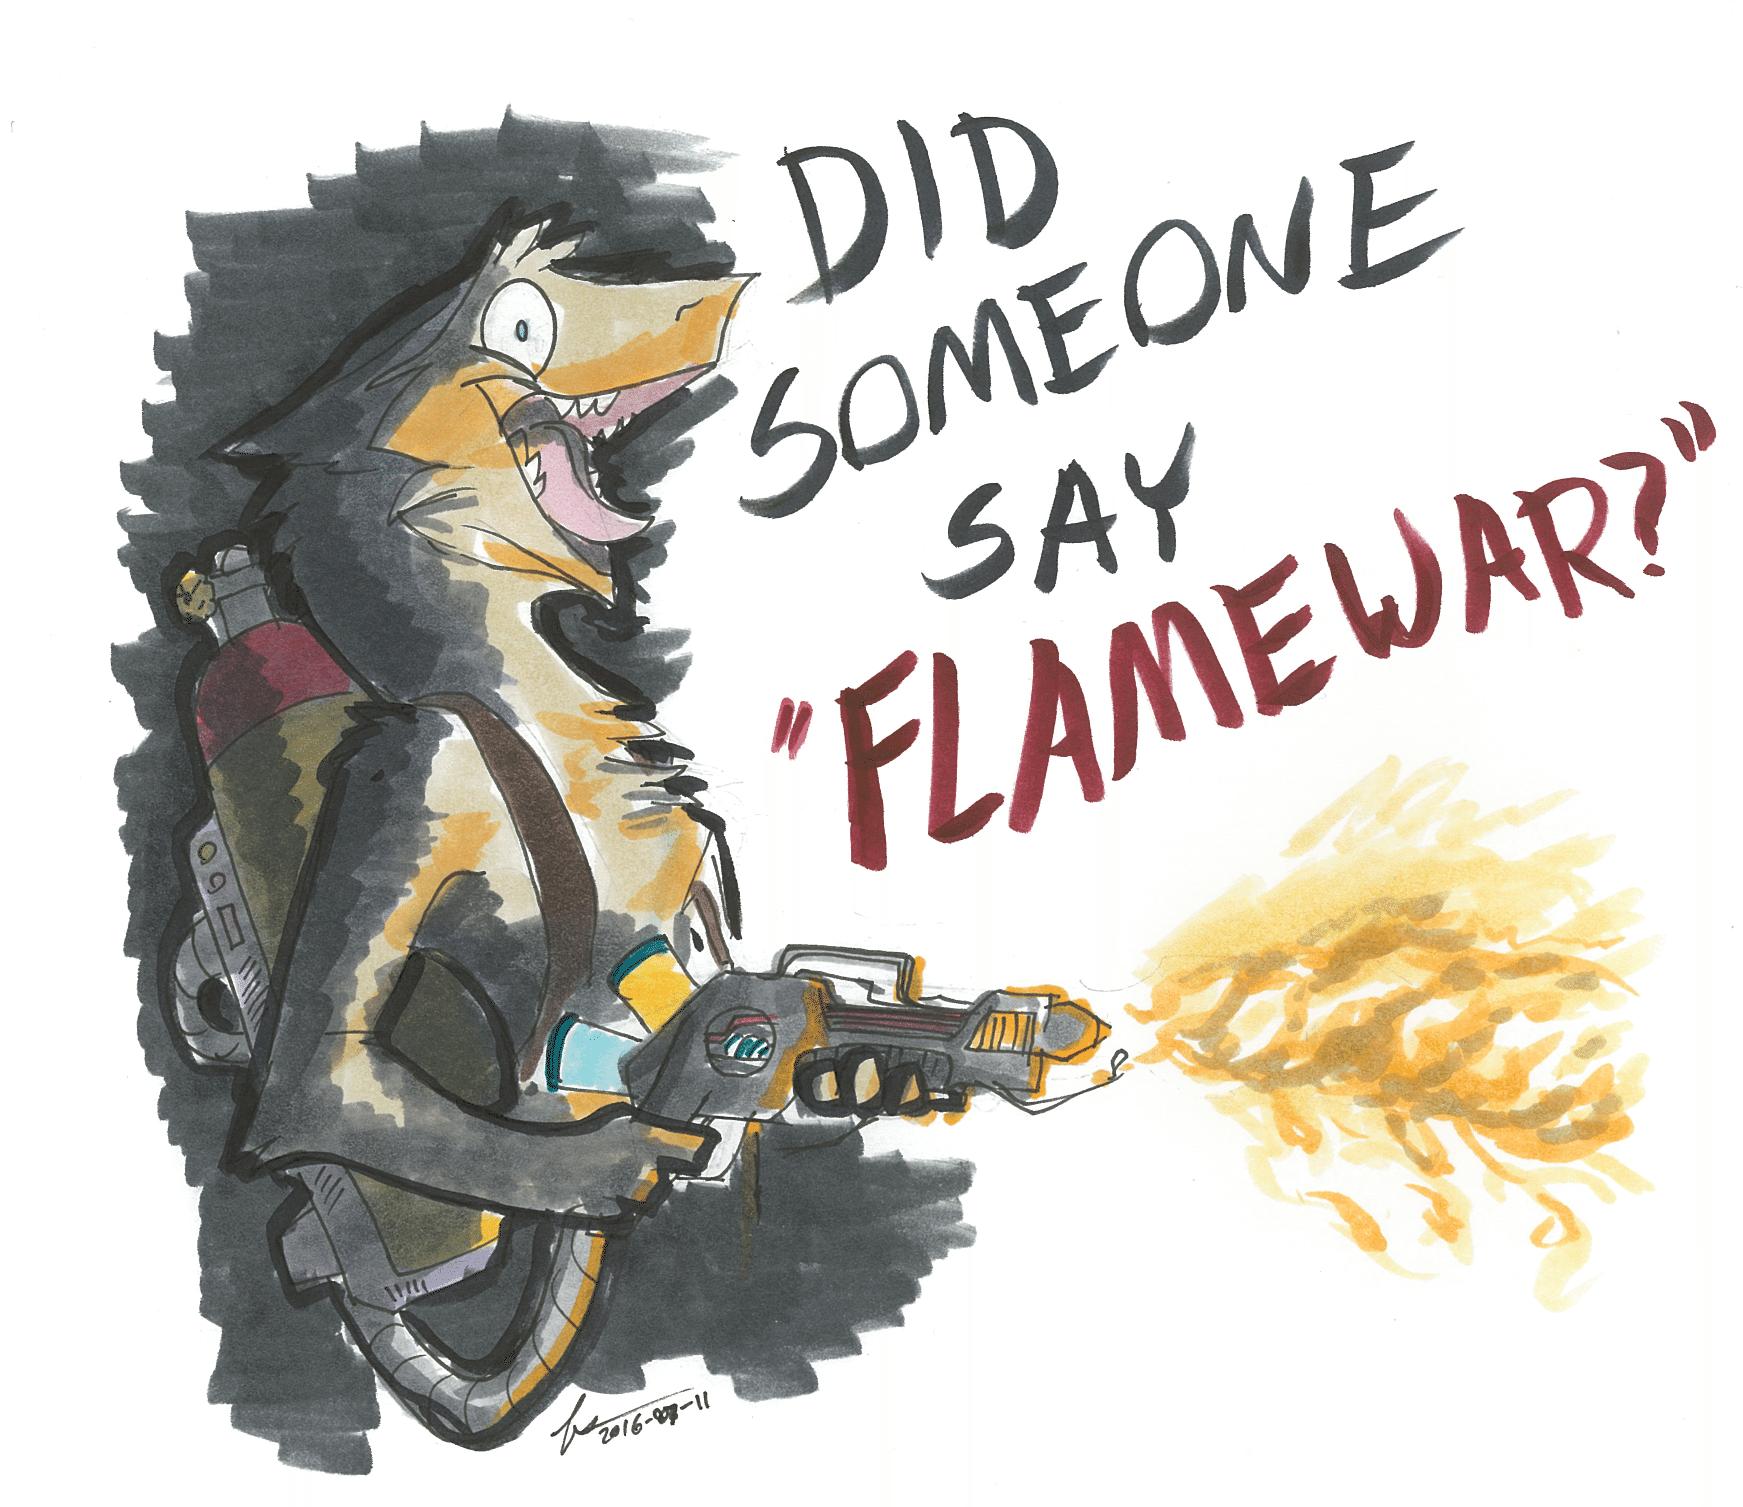 siskmarek-did-someone-say-flame-war.png